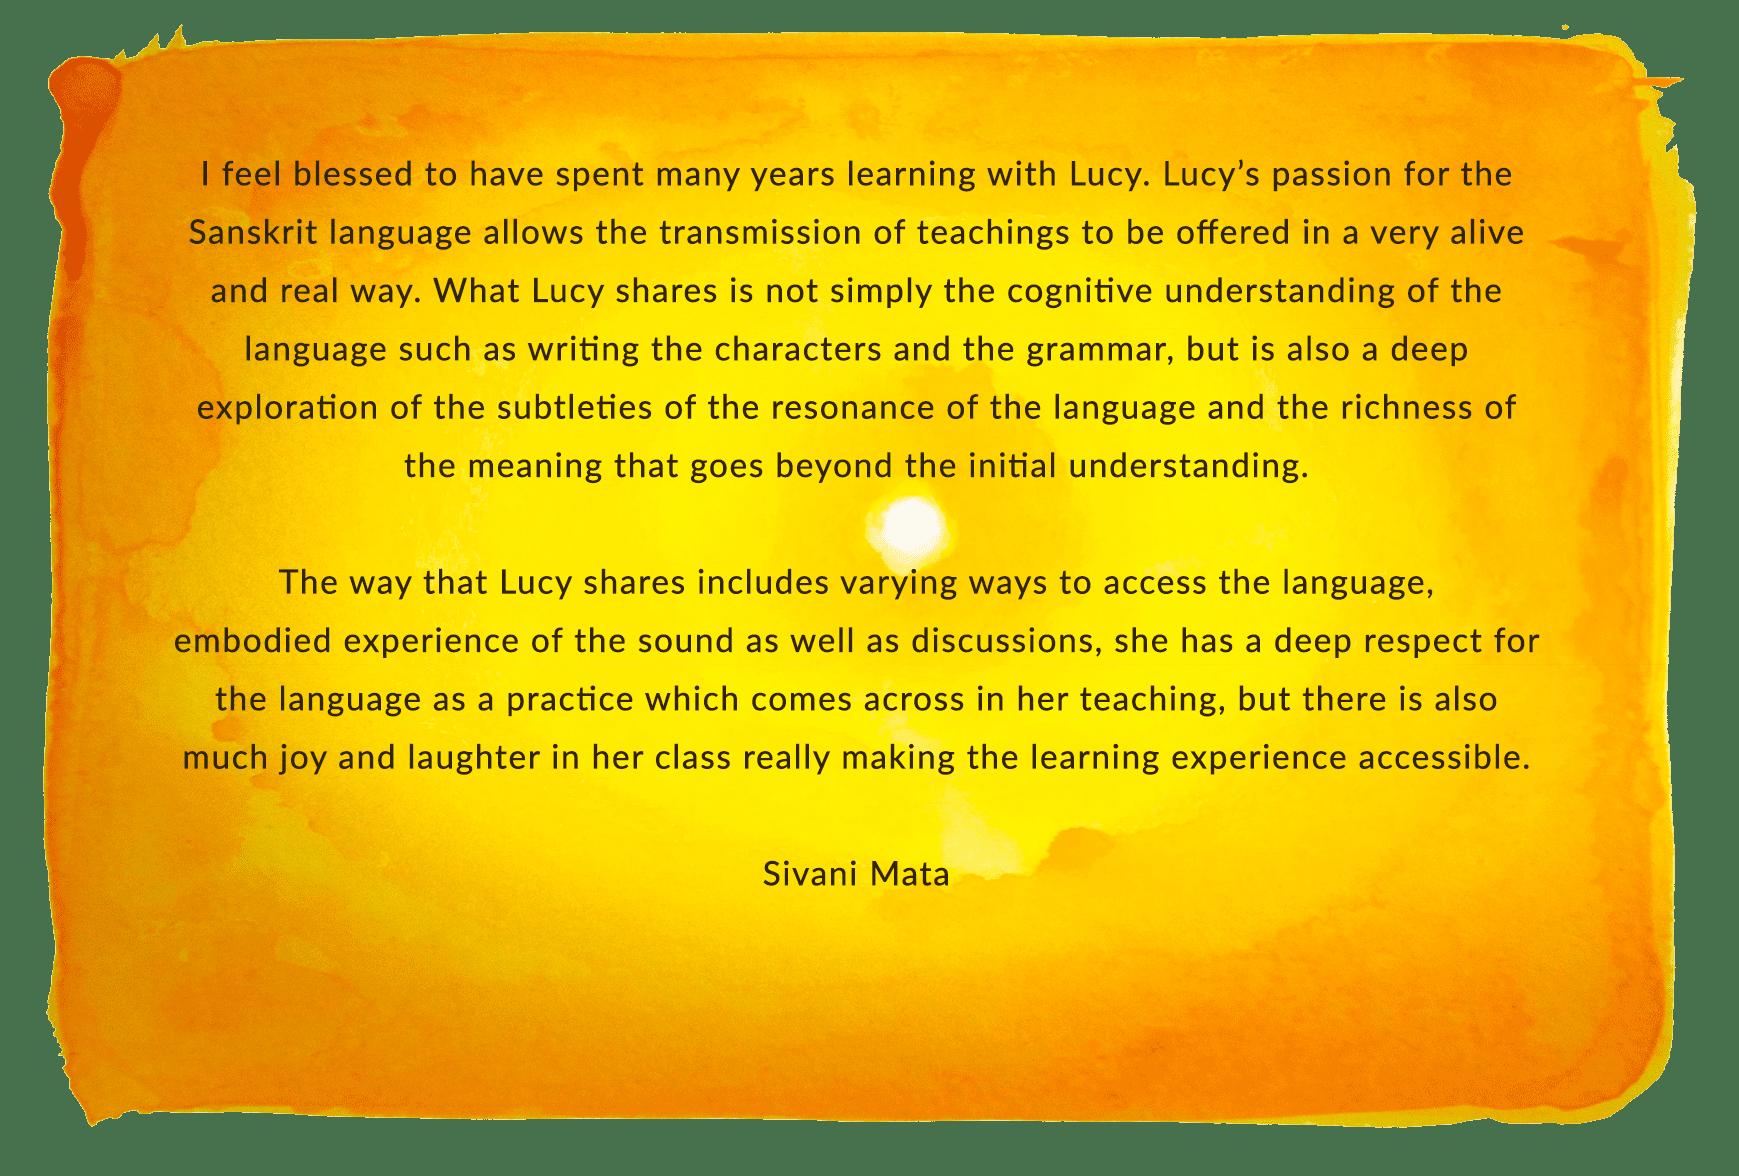 Sivani Mata LARGE BOX